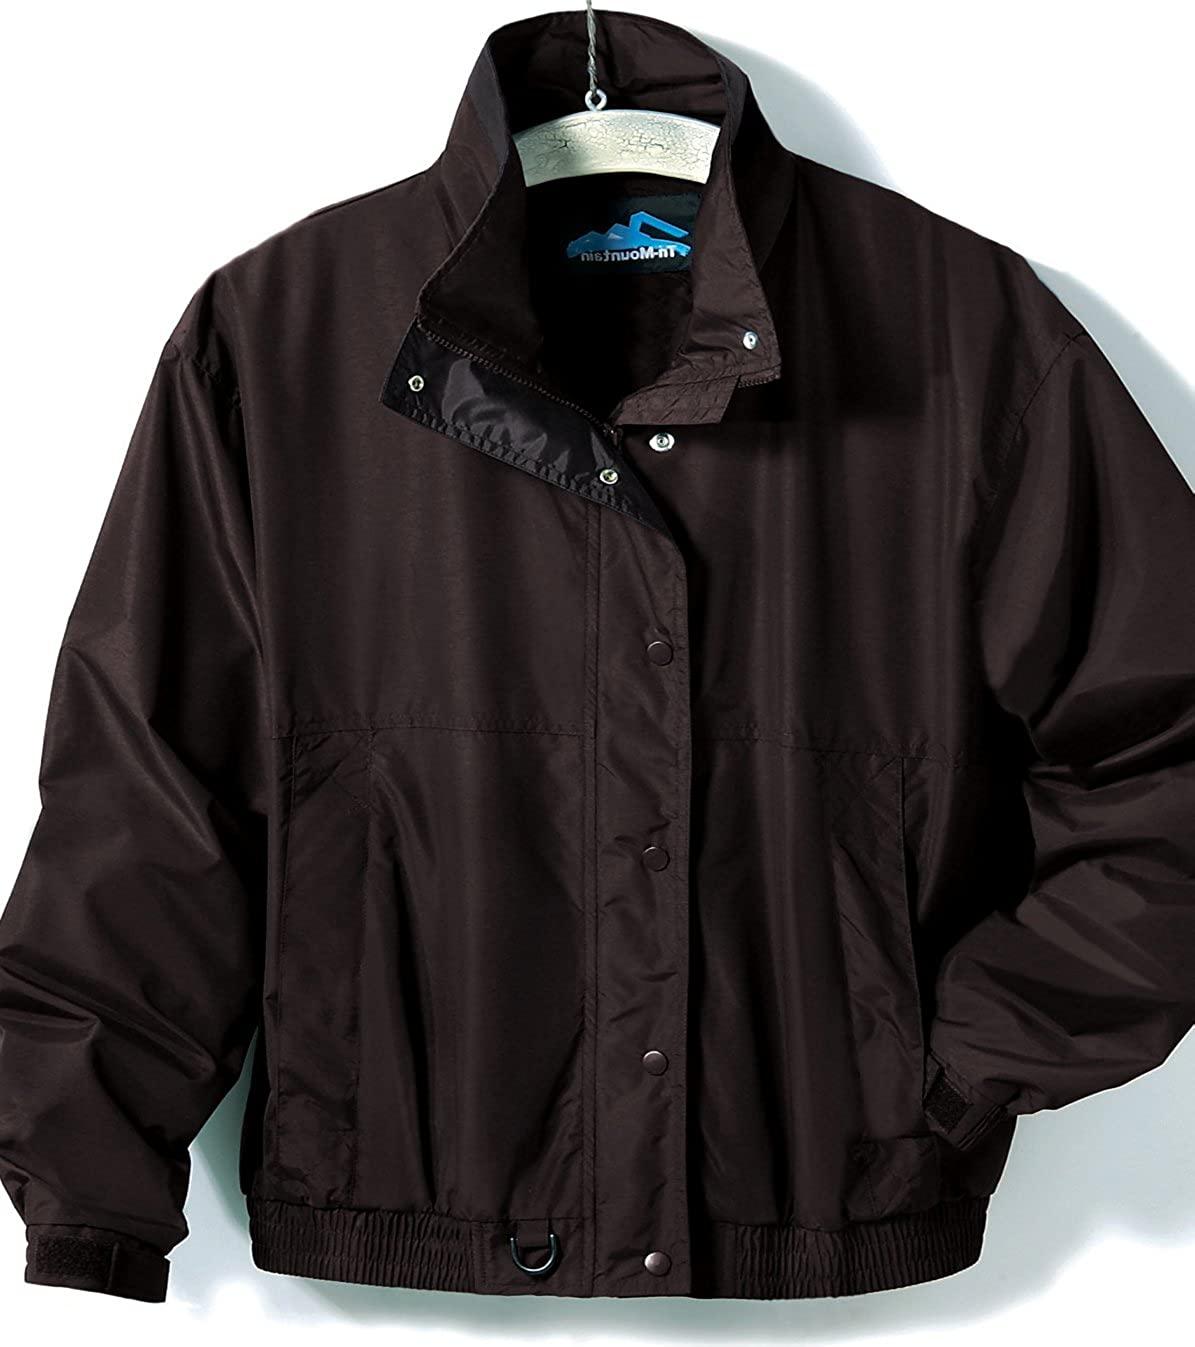 Premium Quality Men's Tall Sizes Heavyweight Nylon Back Country Jacket - Black